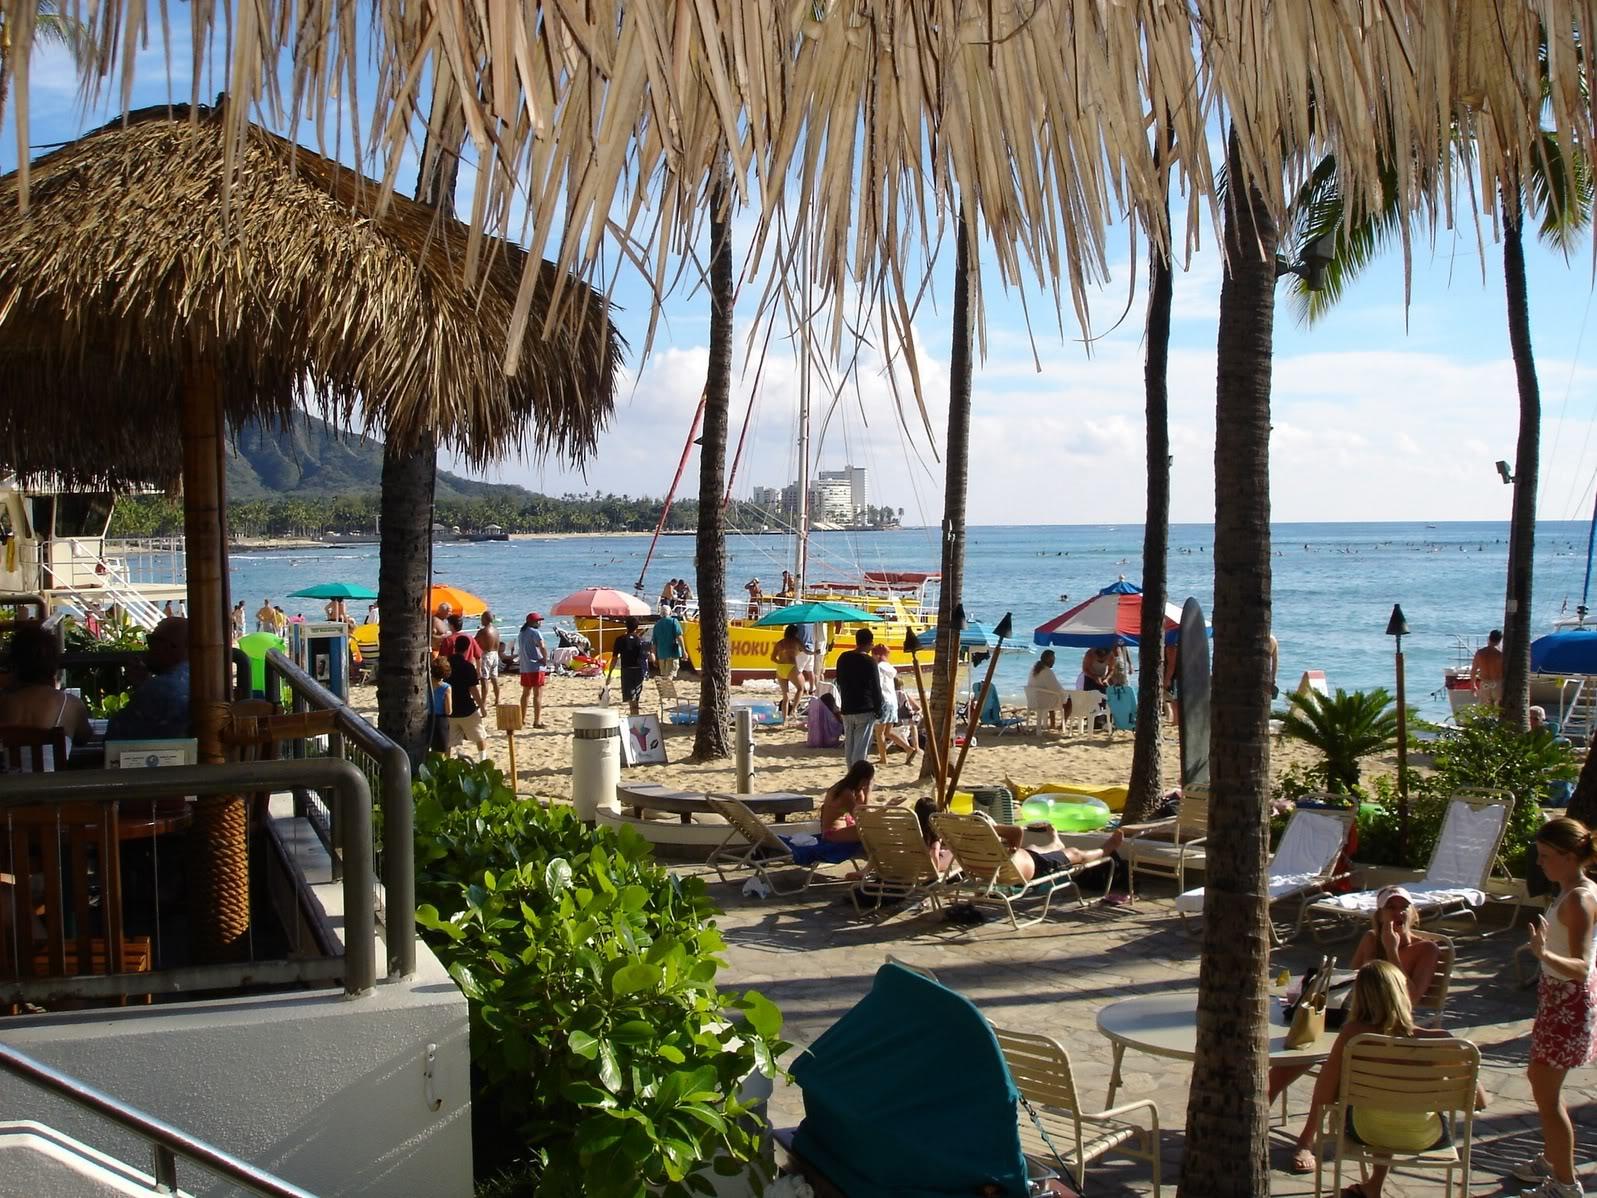 Pickled Pirate Duke S Barefoot Bar Waikiki Oahu